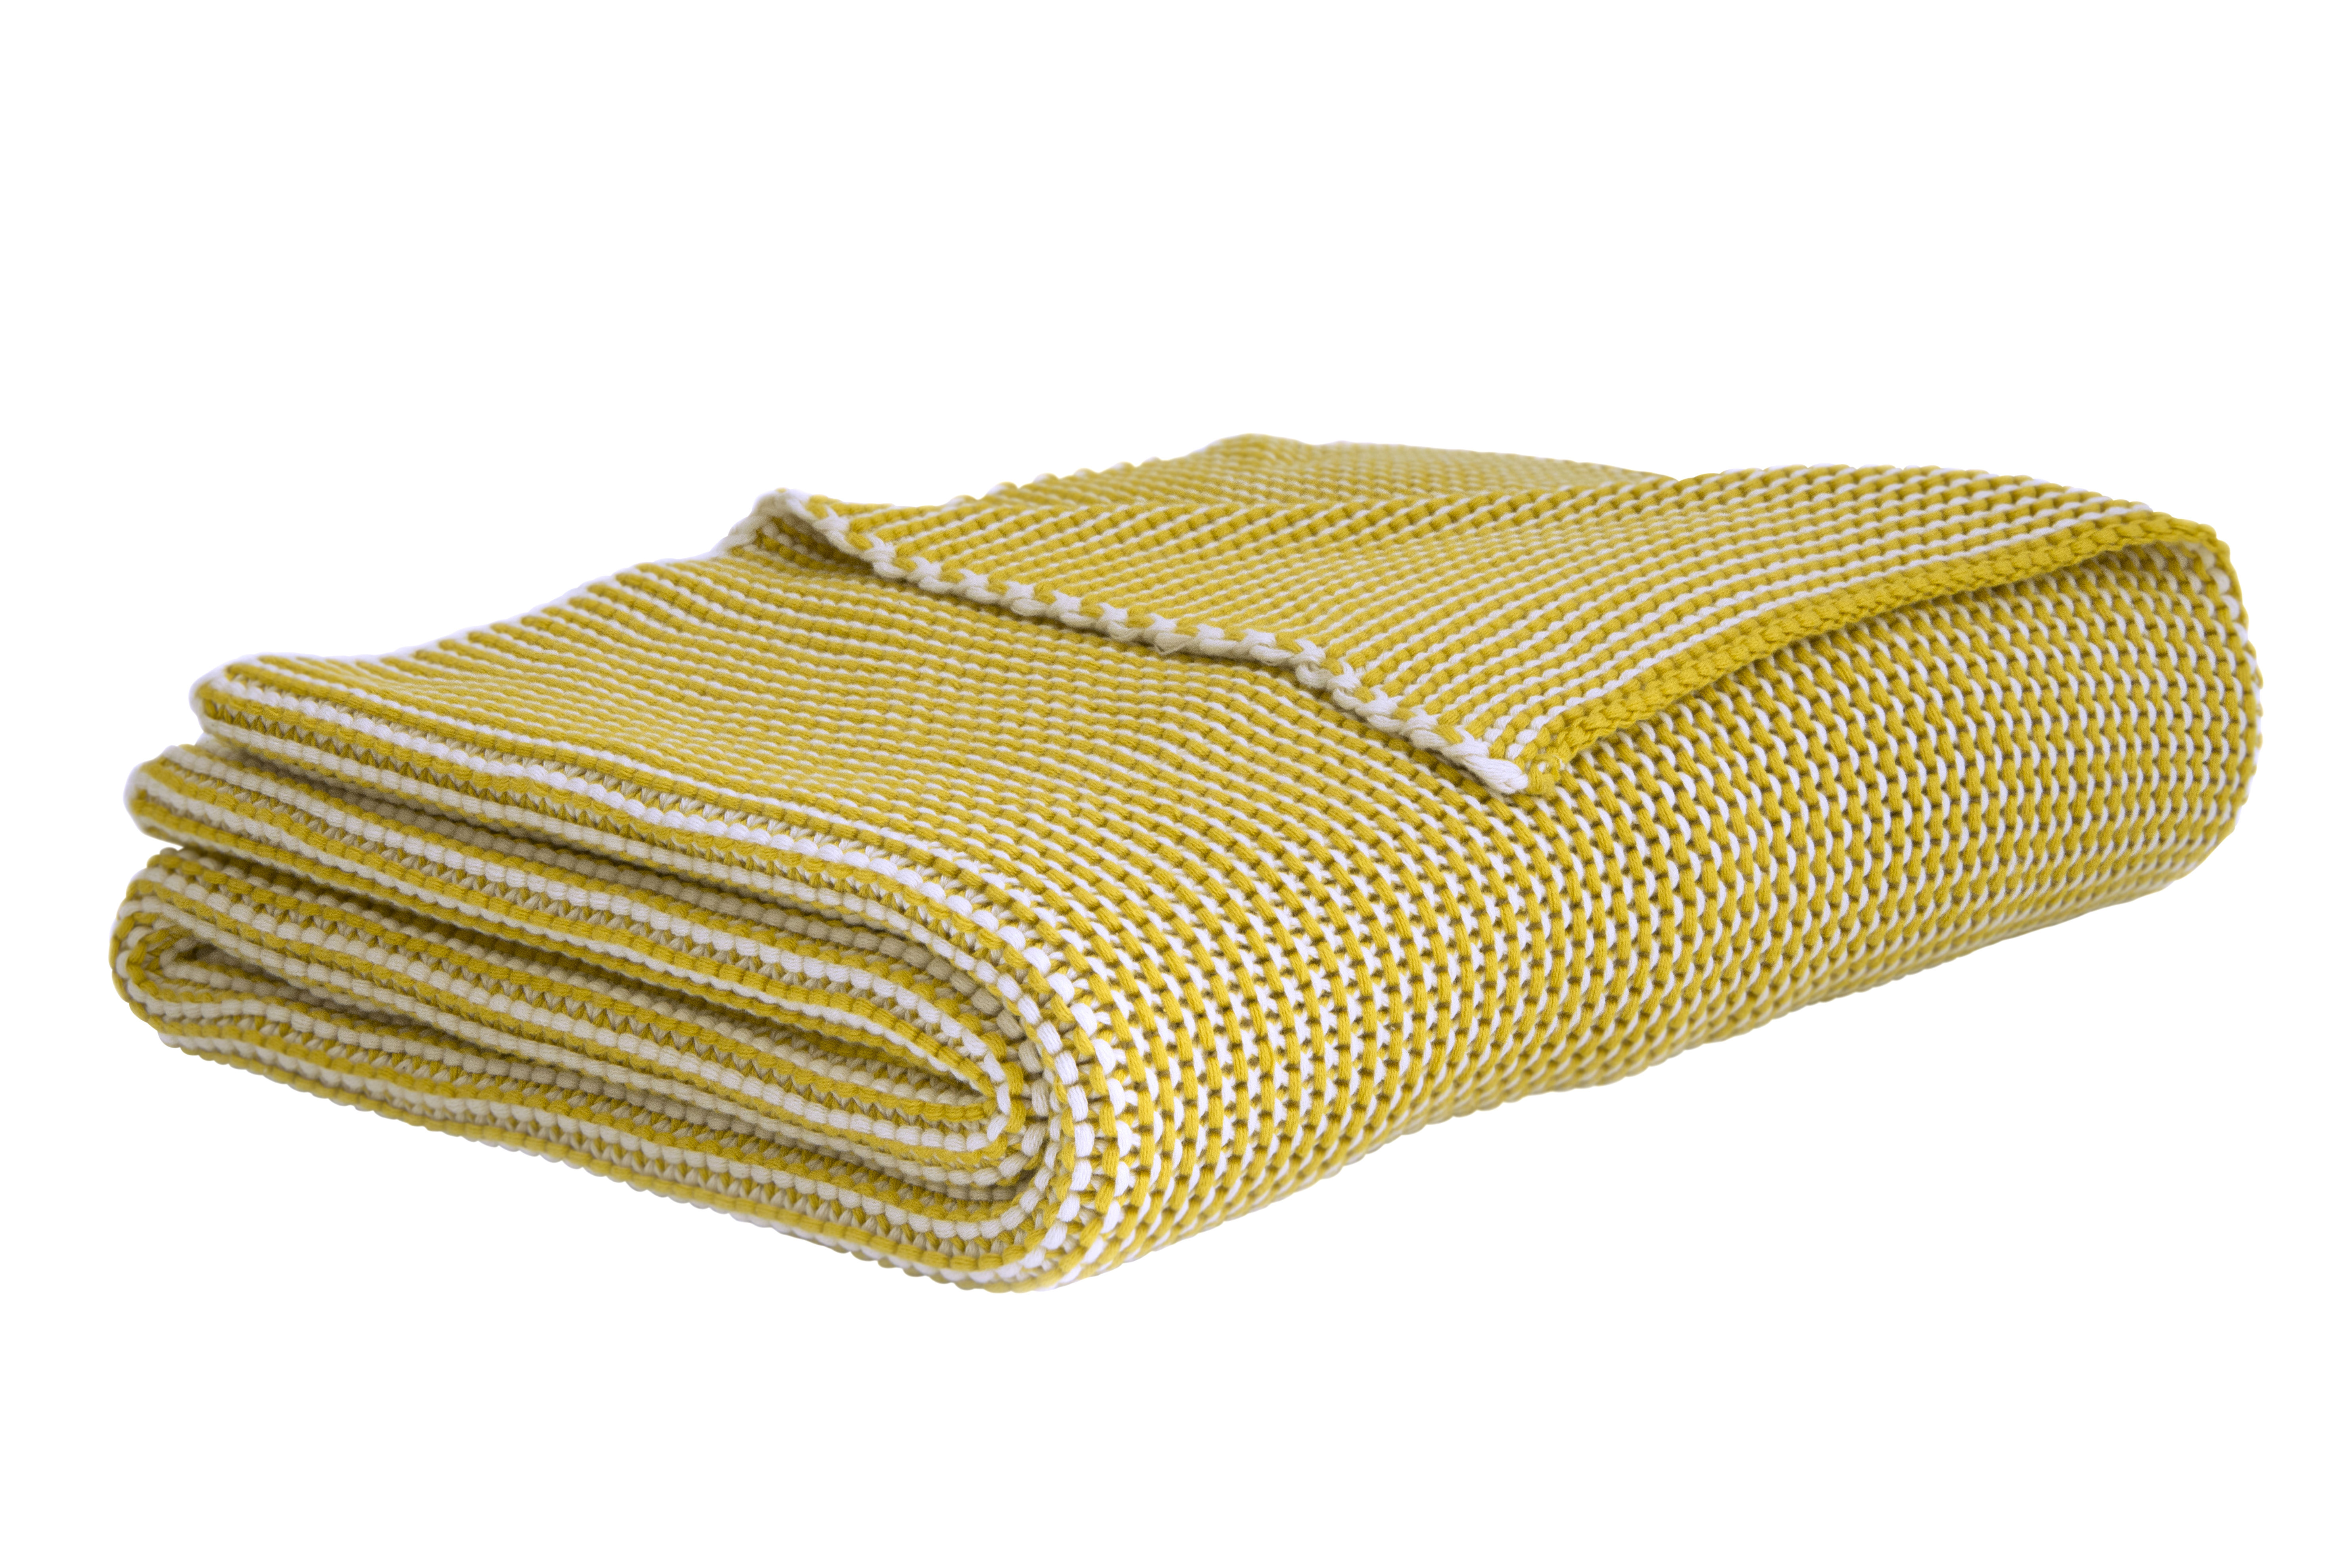 plaid roccamare 130 x 170 cm jaune moutarde enostudio made in design. Black Bedroom Furniture Sets. Home Design Ideas